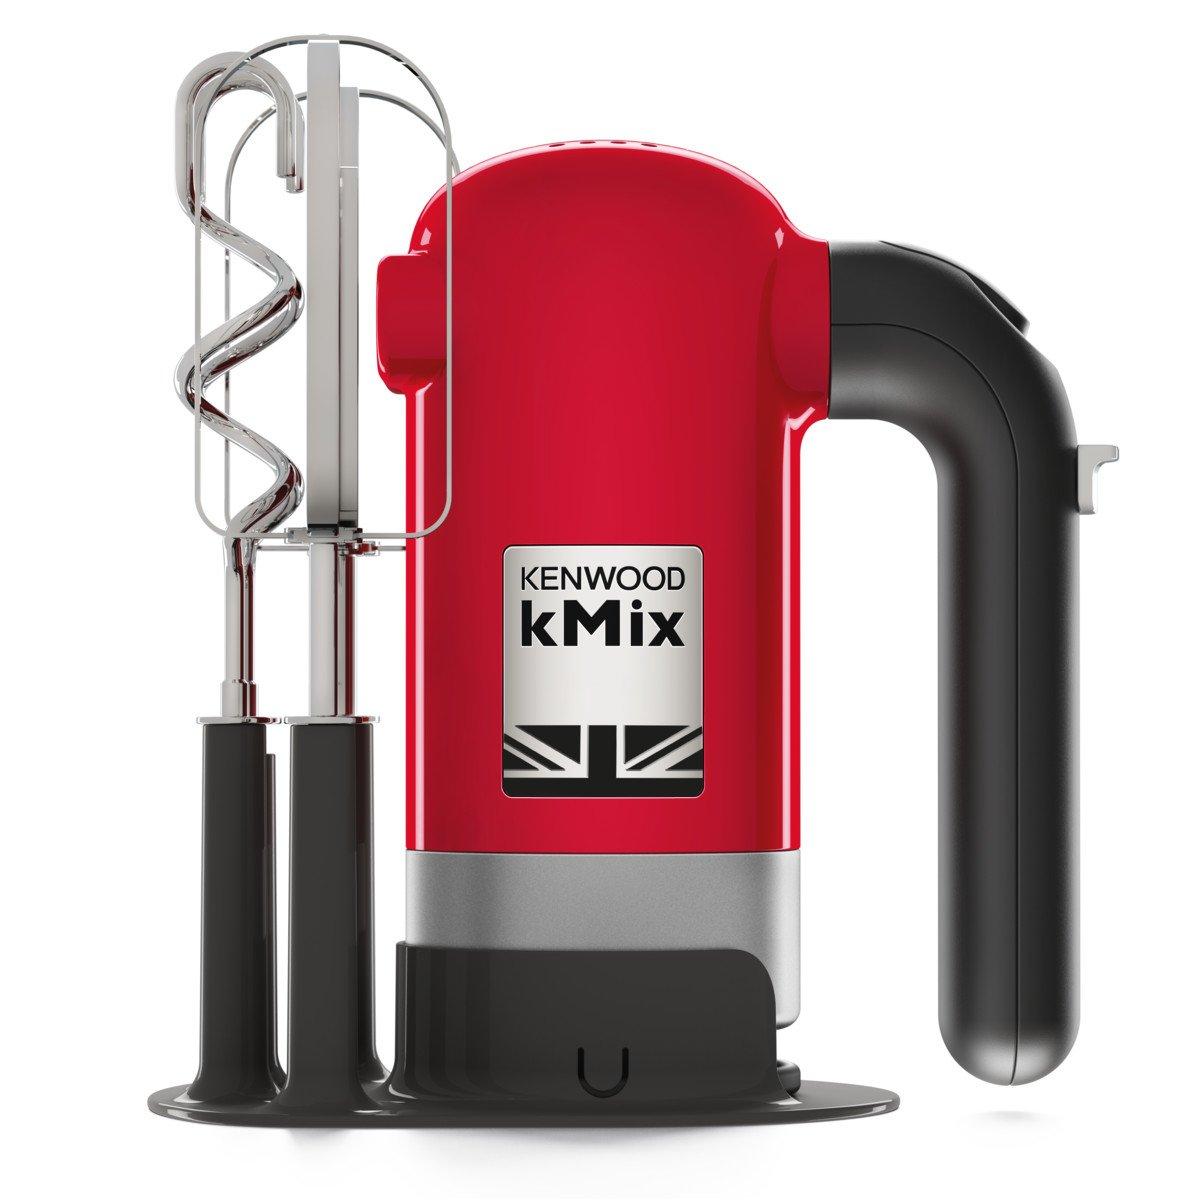 Kenwood Electronics HMX750RD Hand mixer Red 350 W - Batidora (Hand mixer, Red, Beat,Knead,Mixing, Buttons, Cast iron, Stainless steel): Amazon.es: Hogar